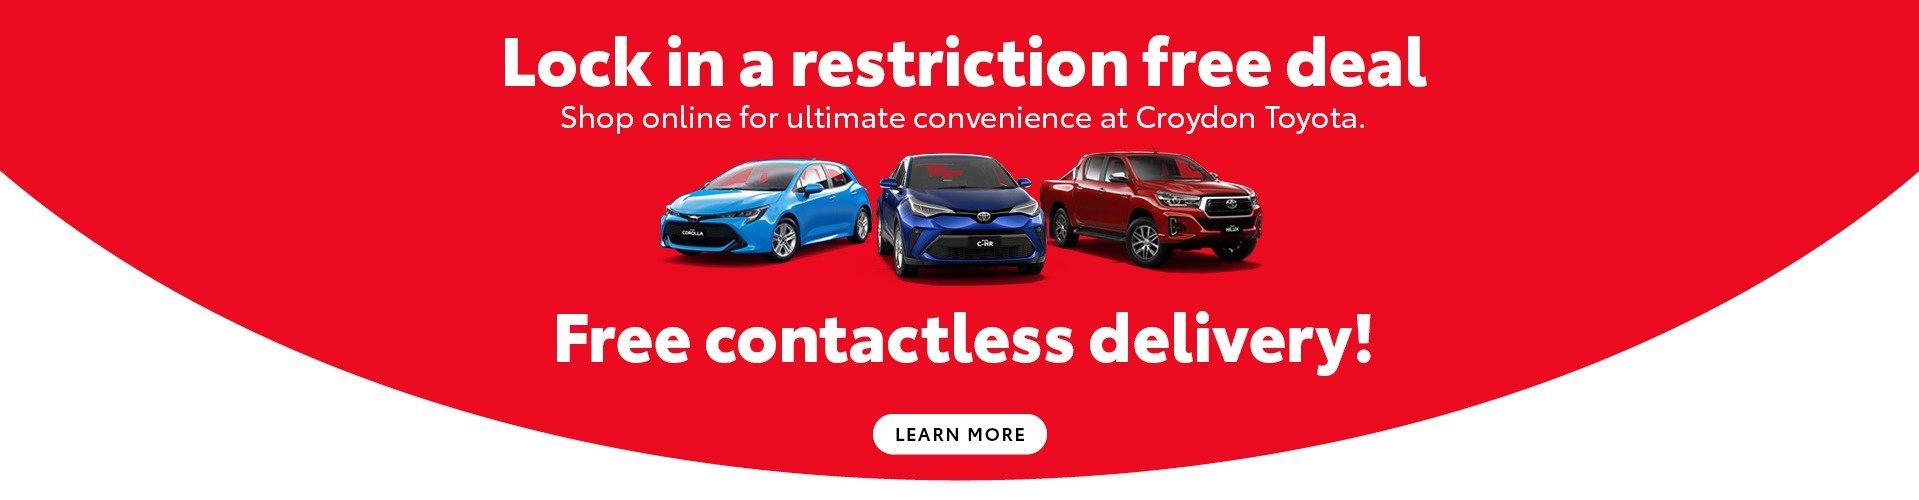 Croydon Toyota Value Advantage